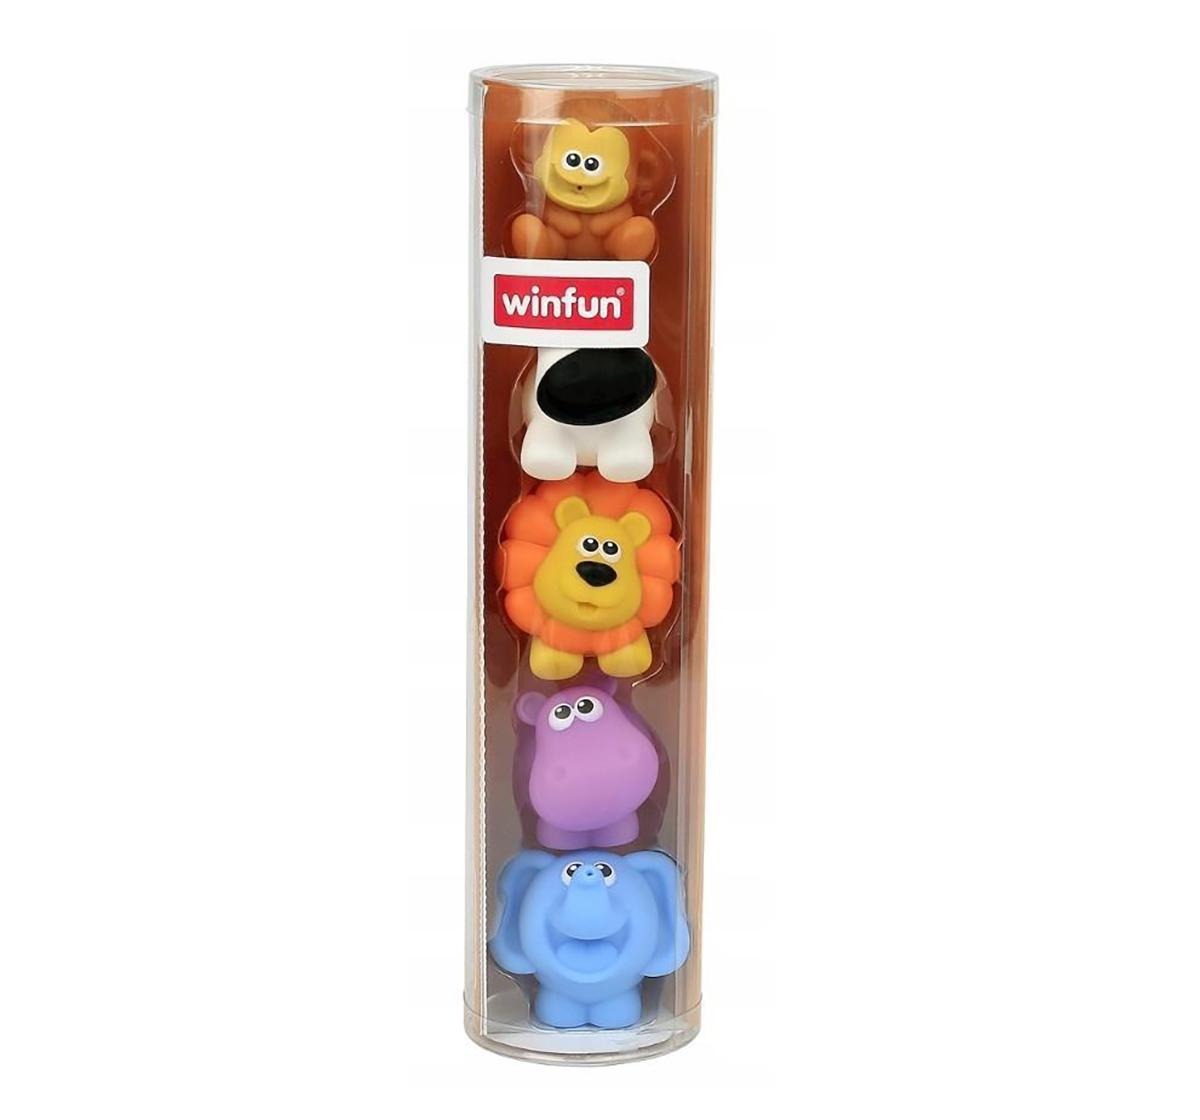 WinFun | Winfun My Jungle Pals Set-Bath Toys & Accessories for Kids age 6M+